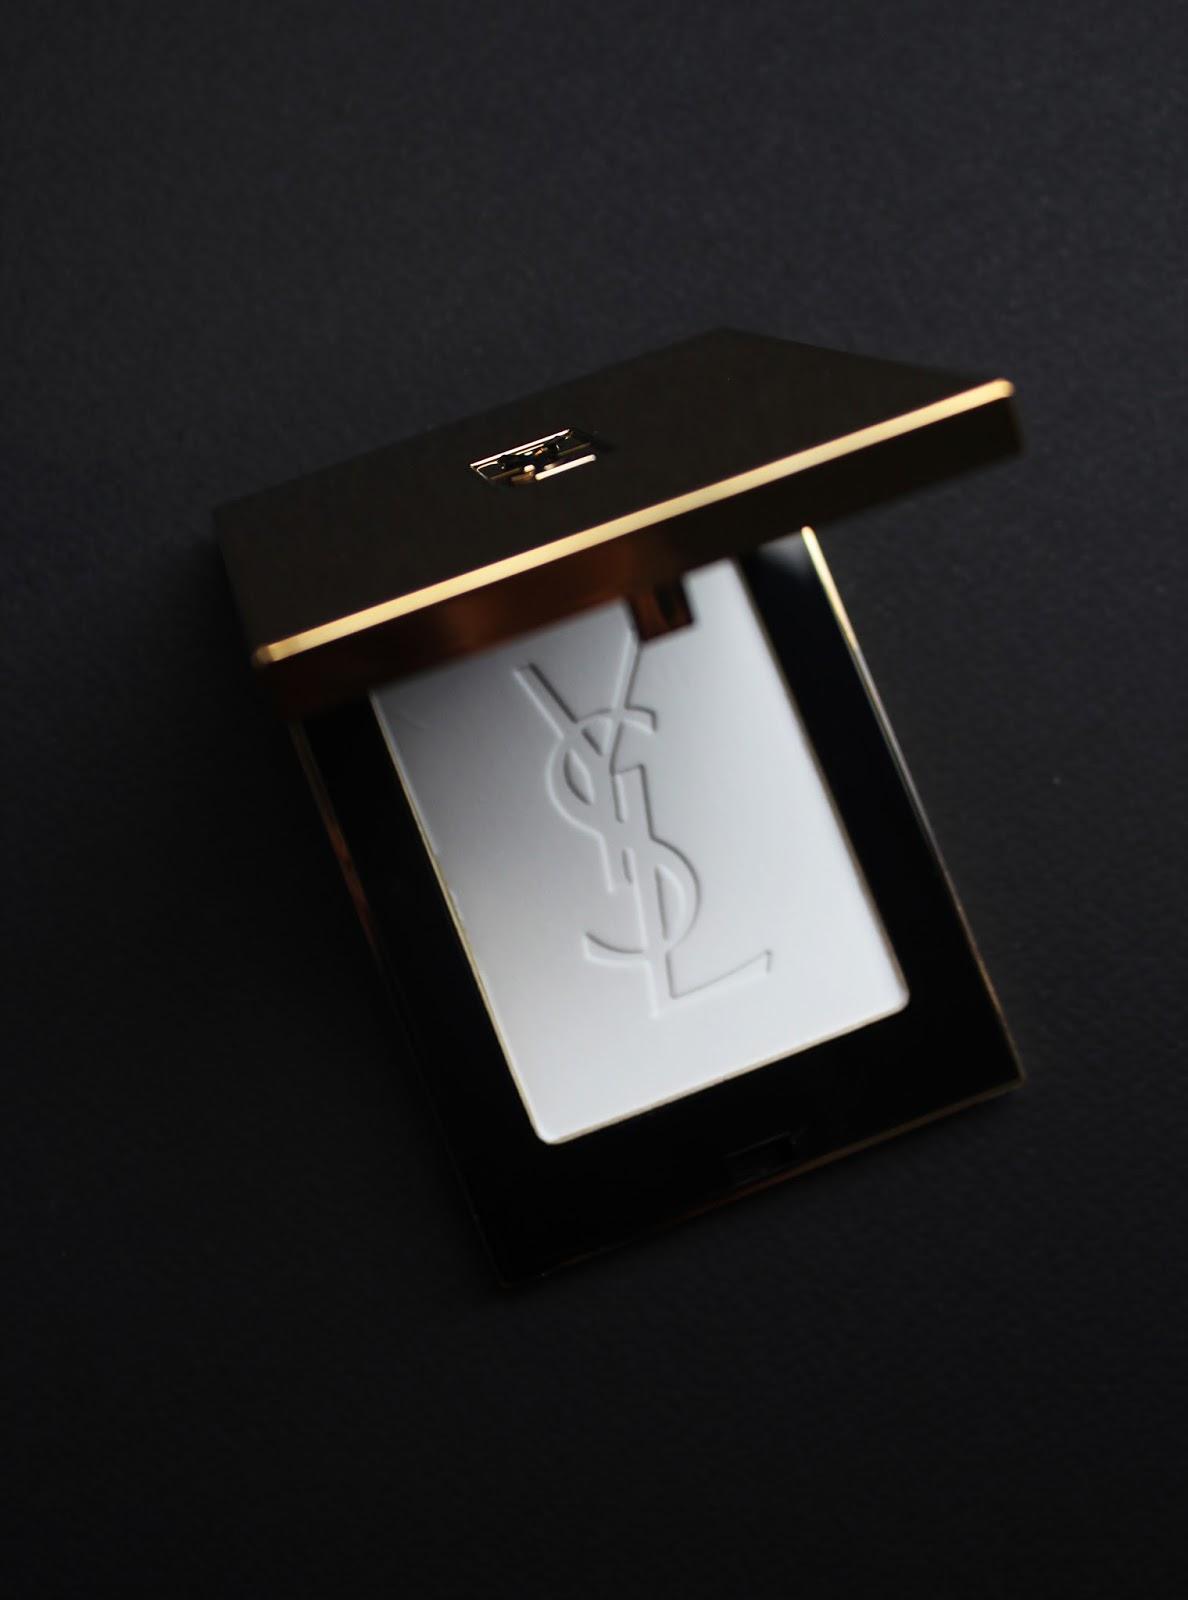 пудра-фиксатор Poudre Compacte Radiance Perfectrice Universelle YSL